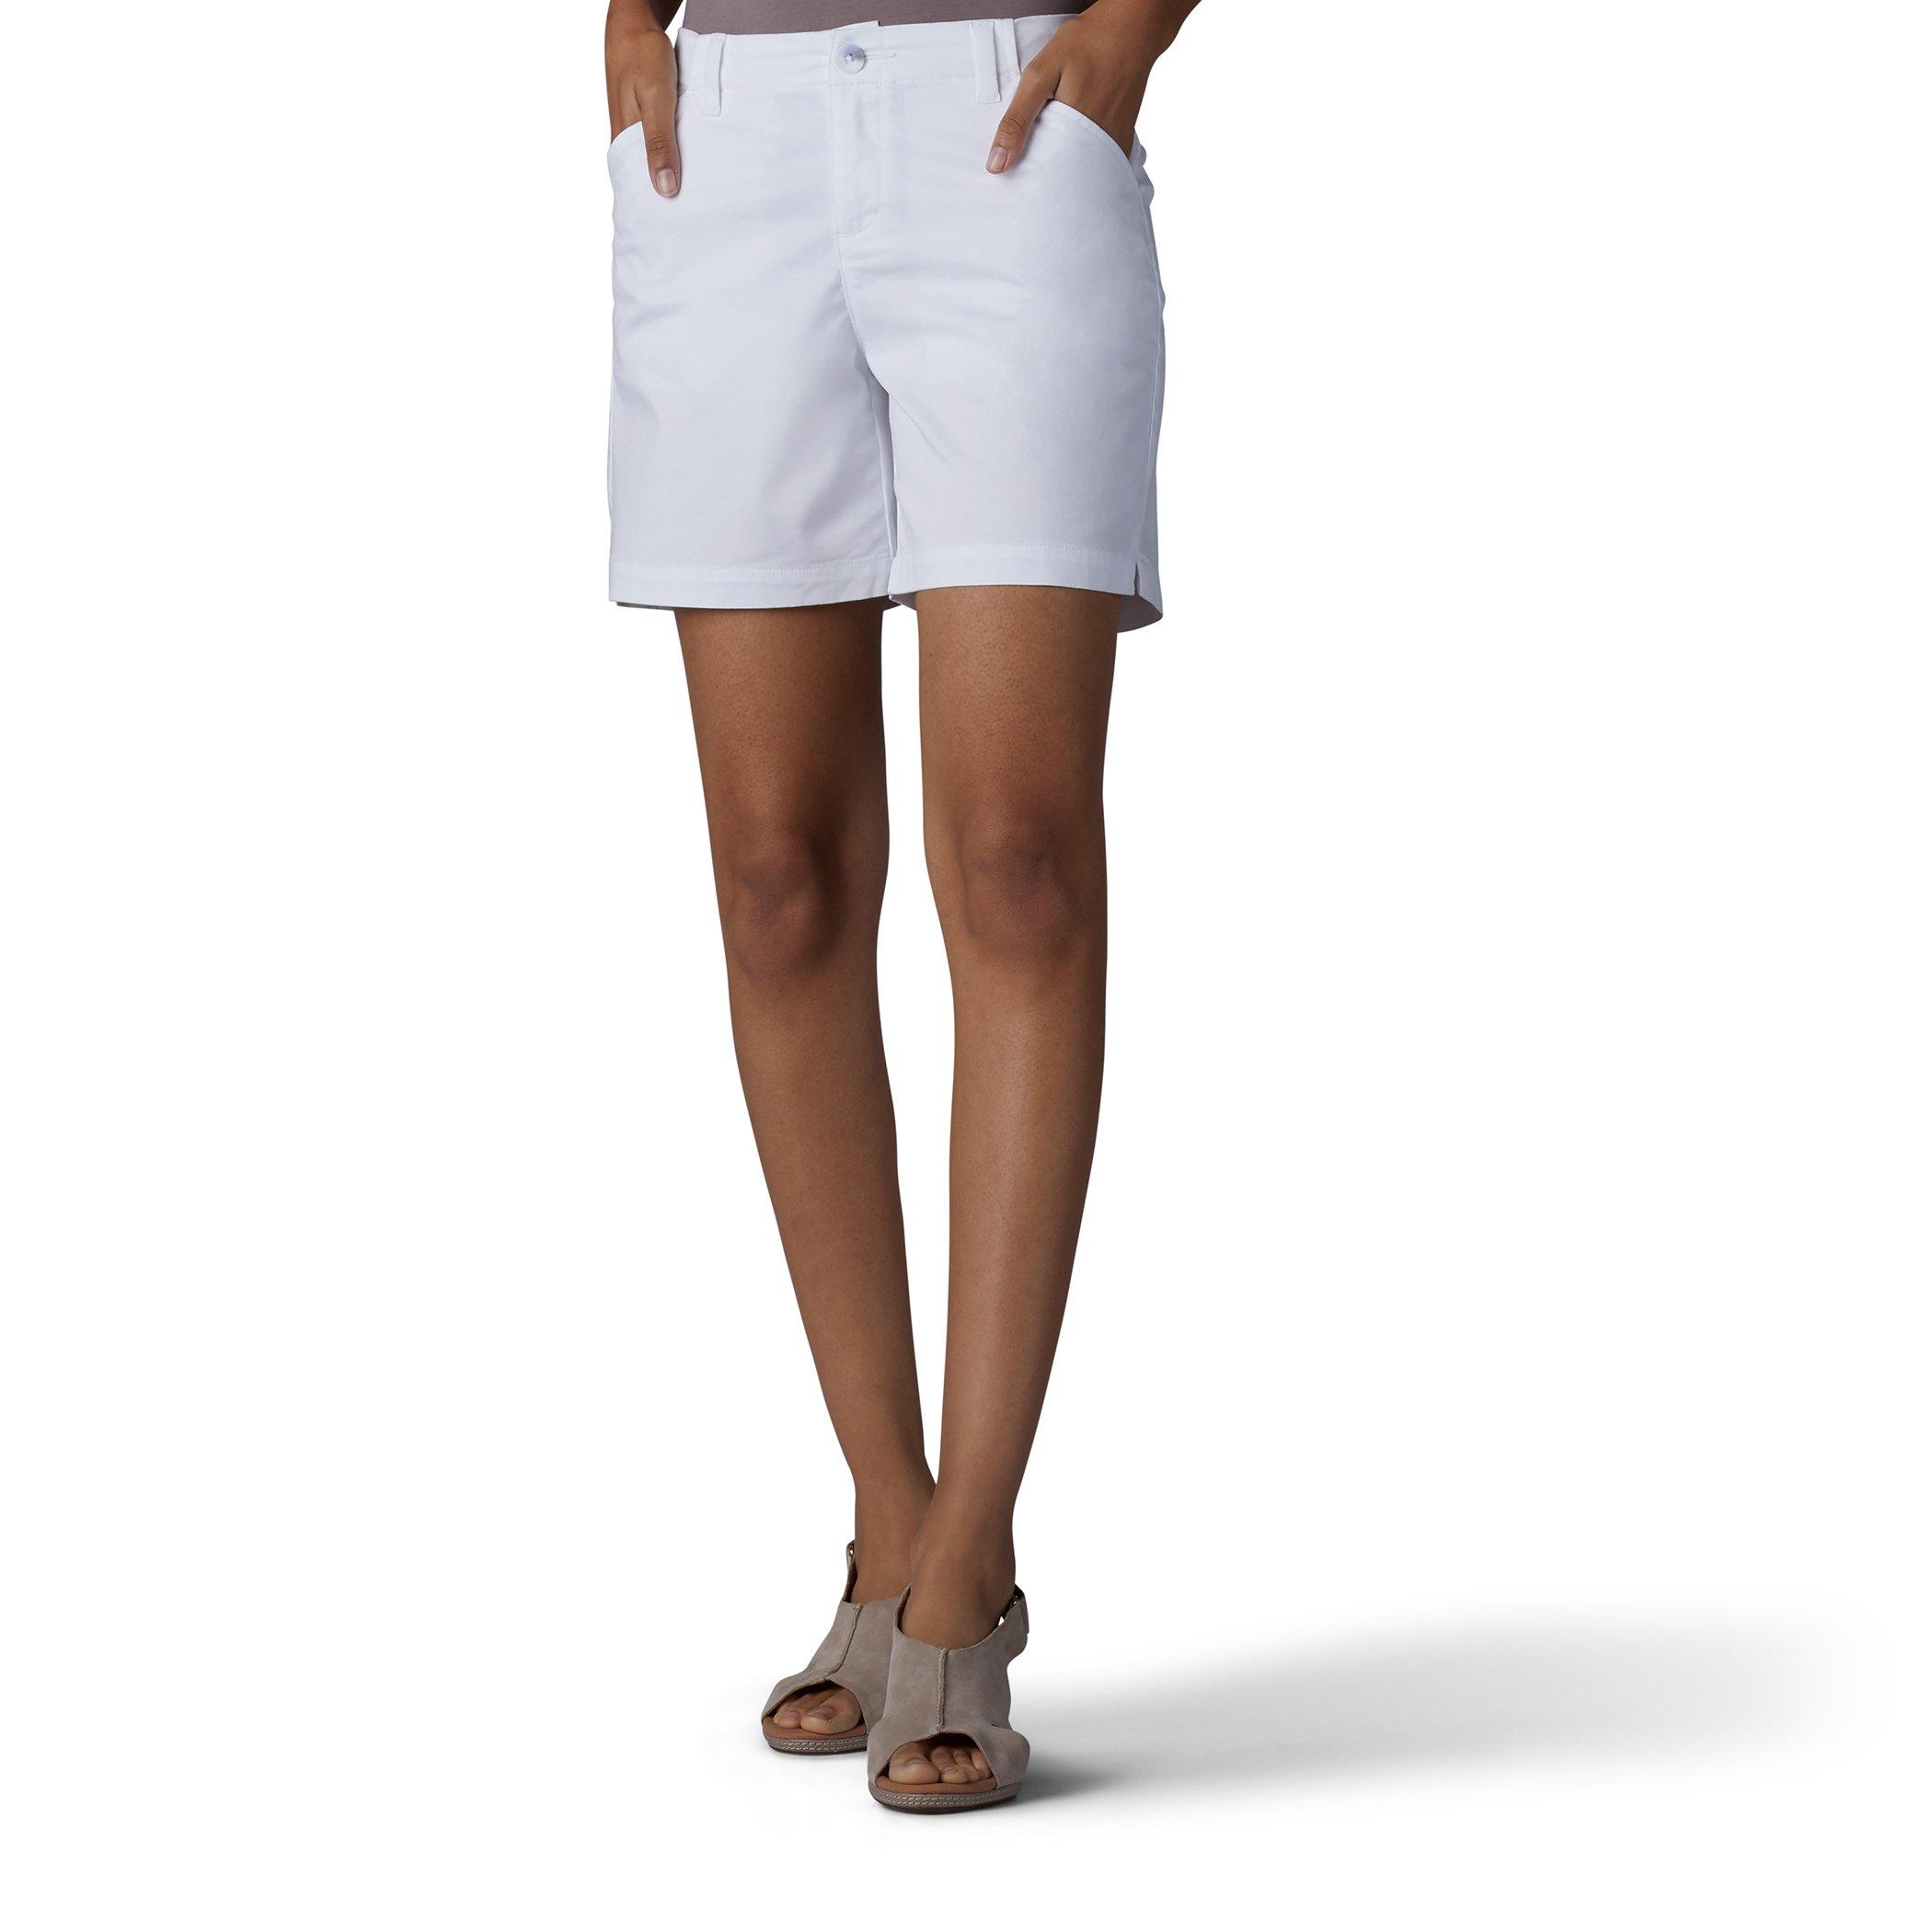 LEE Women's Straight Fit Tailored Chino Short, White, 10